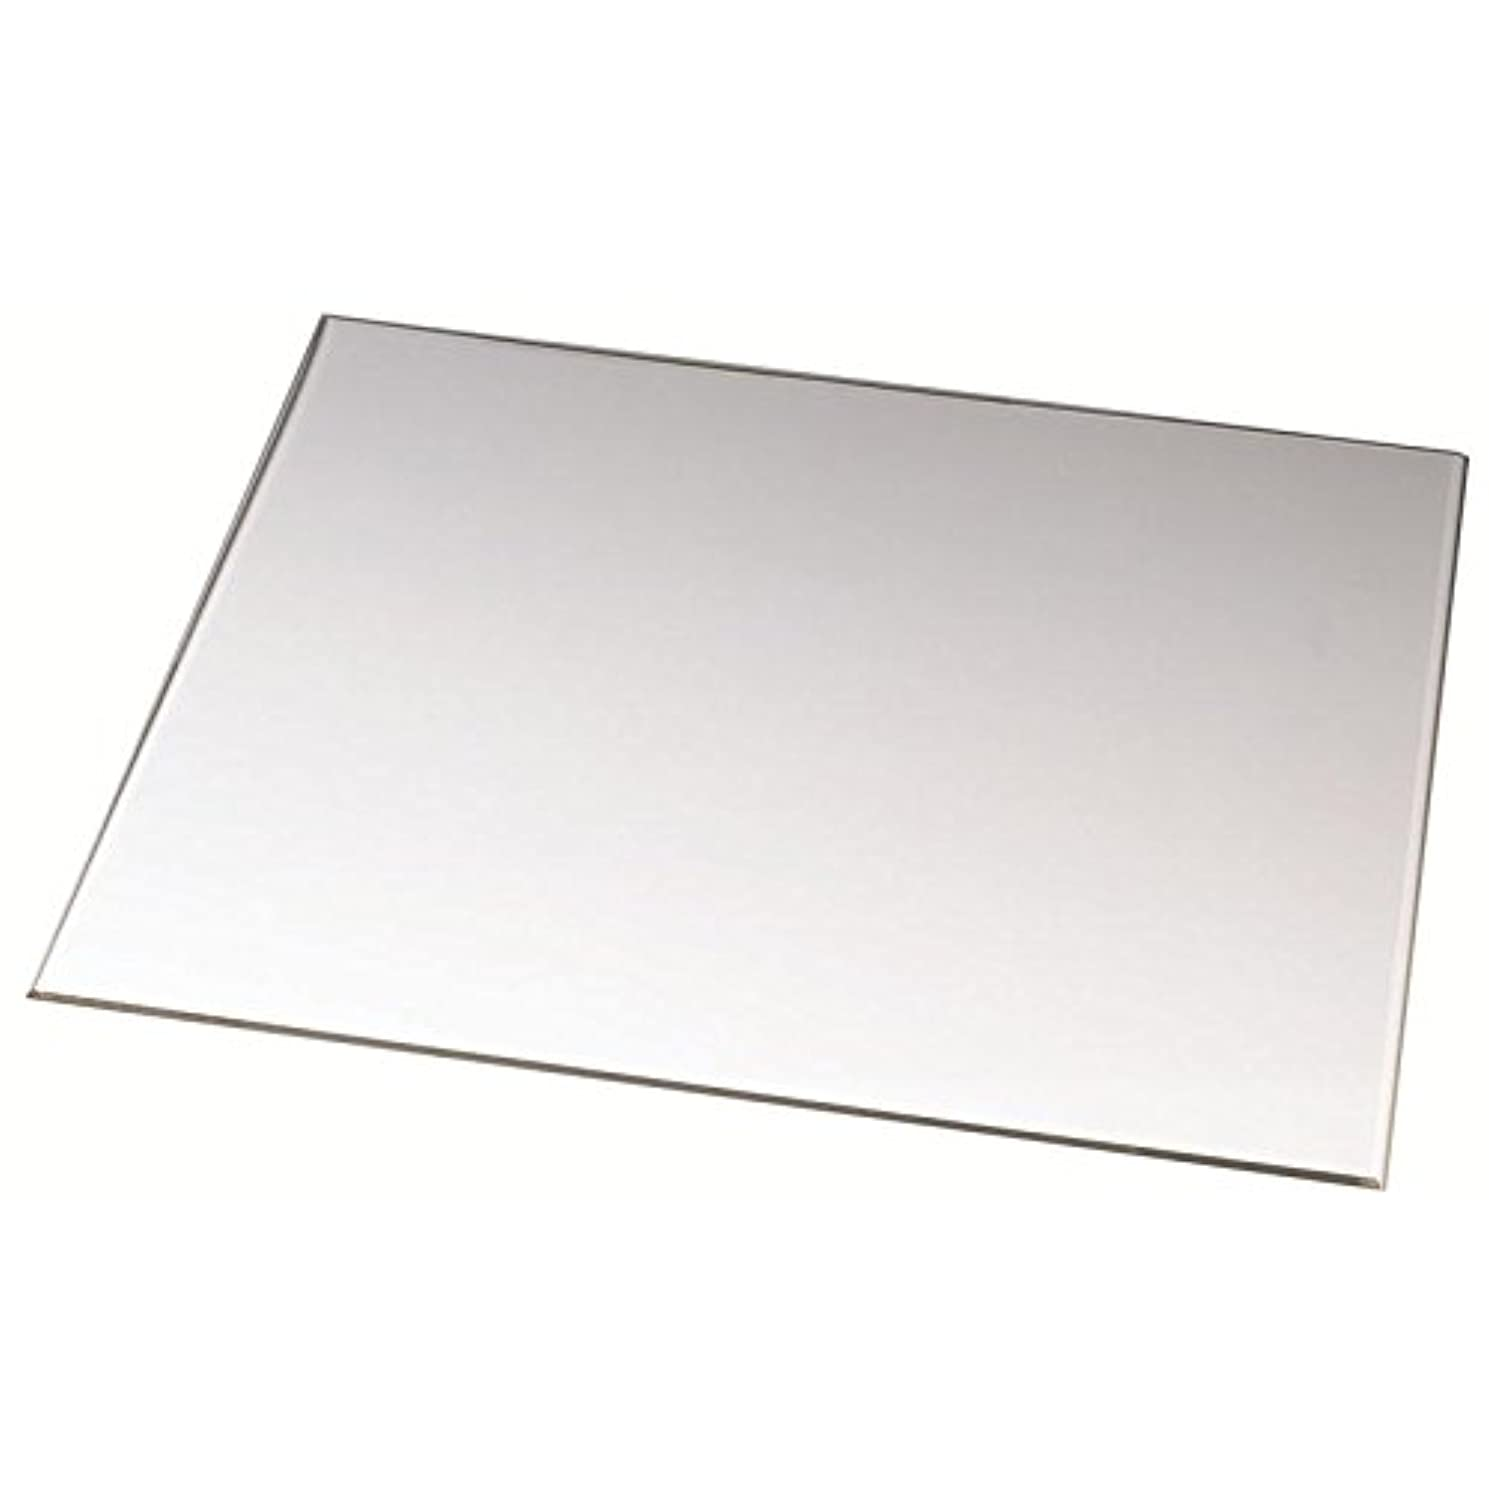 Maul Acrylic Desk Pad, Transparent